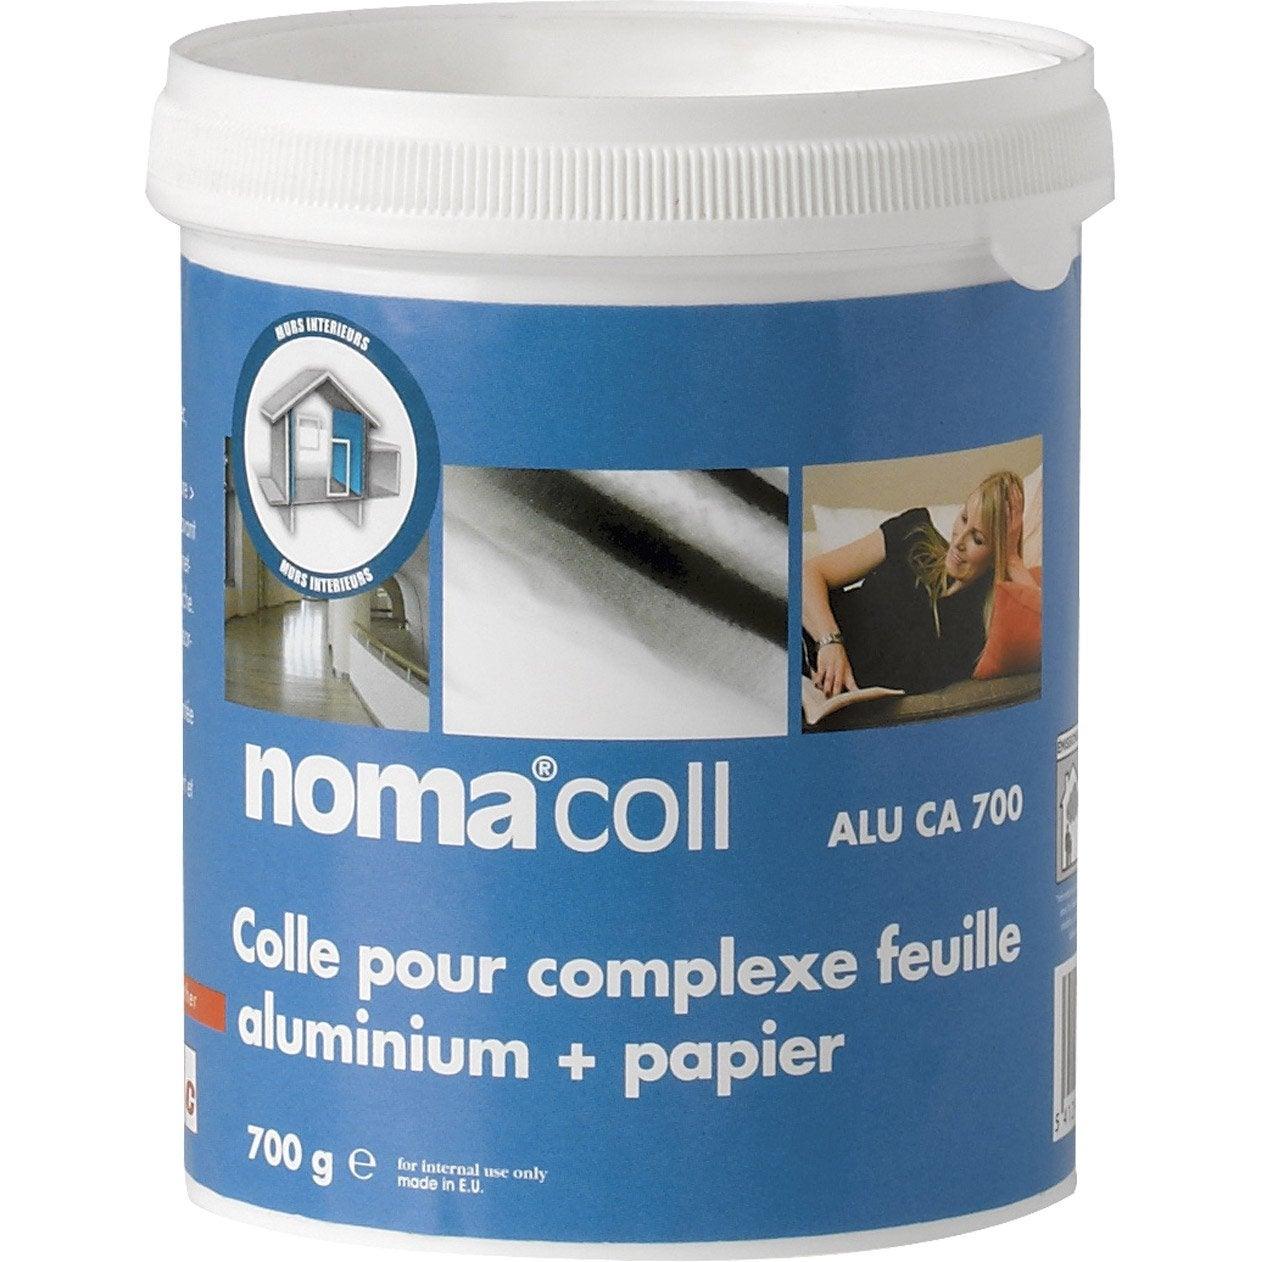 Colle pour mat riaux isolants universelle tous supports noma coll leroy m - Colle pour gazon synthetique leroy merlin ...